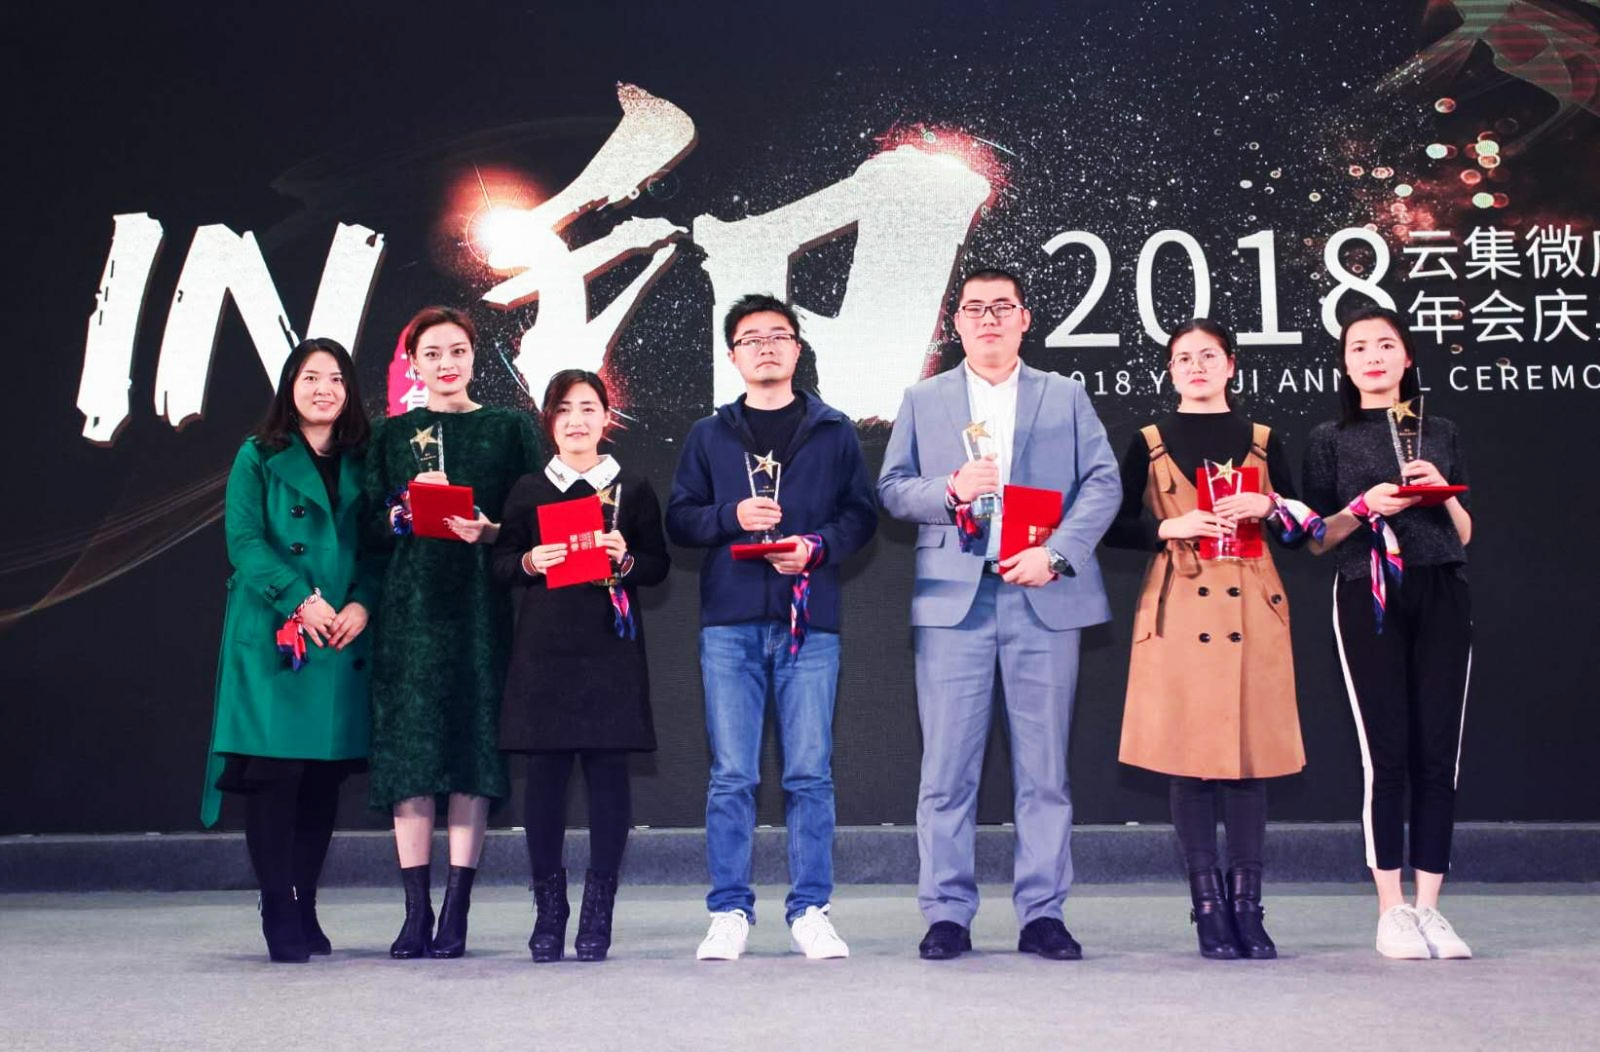 """IN印云集""2018云集微店年会庆典-16"